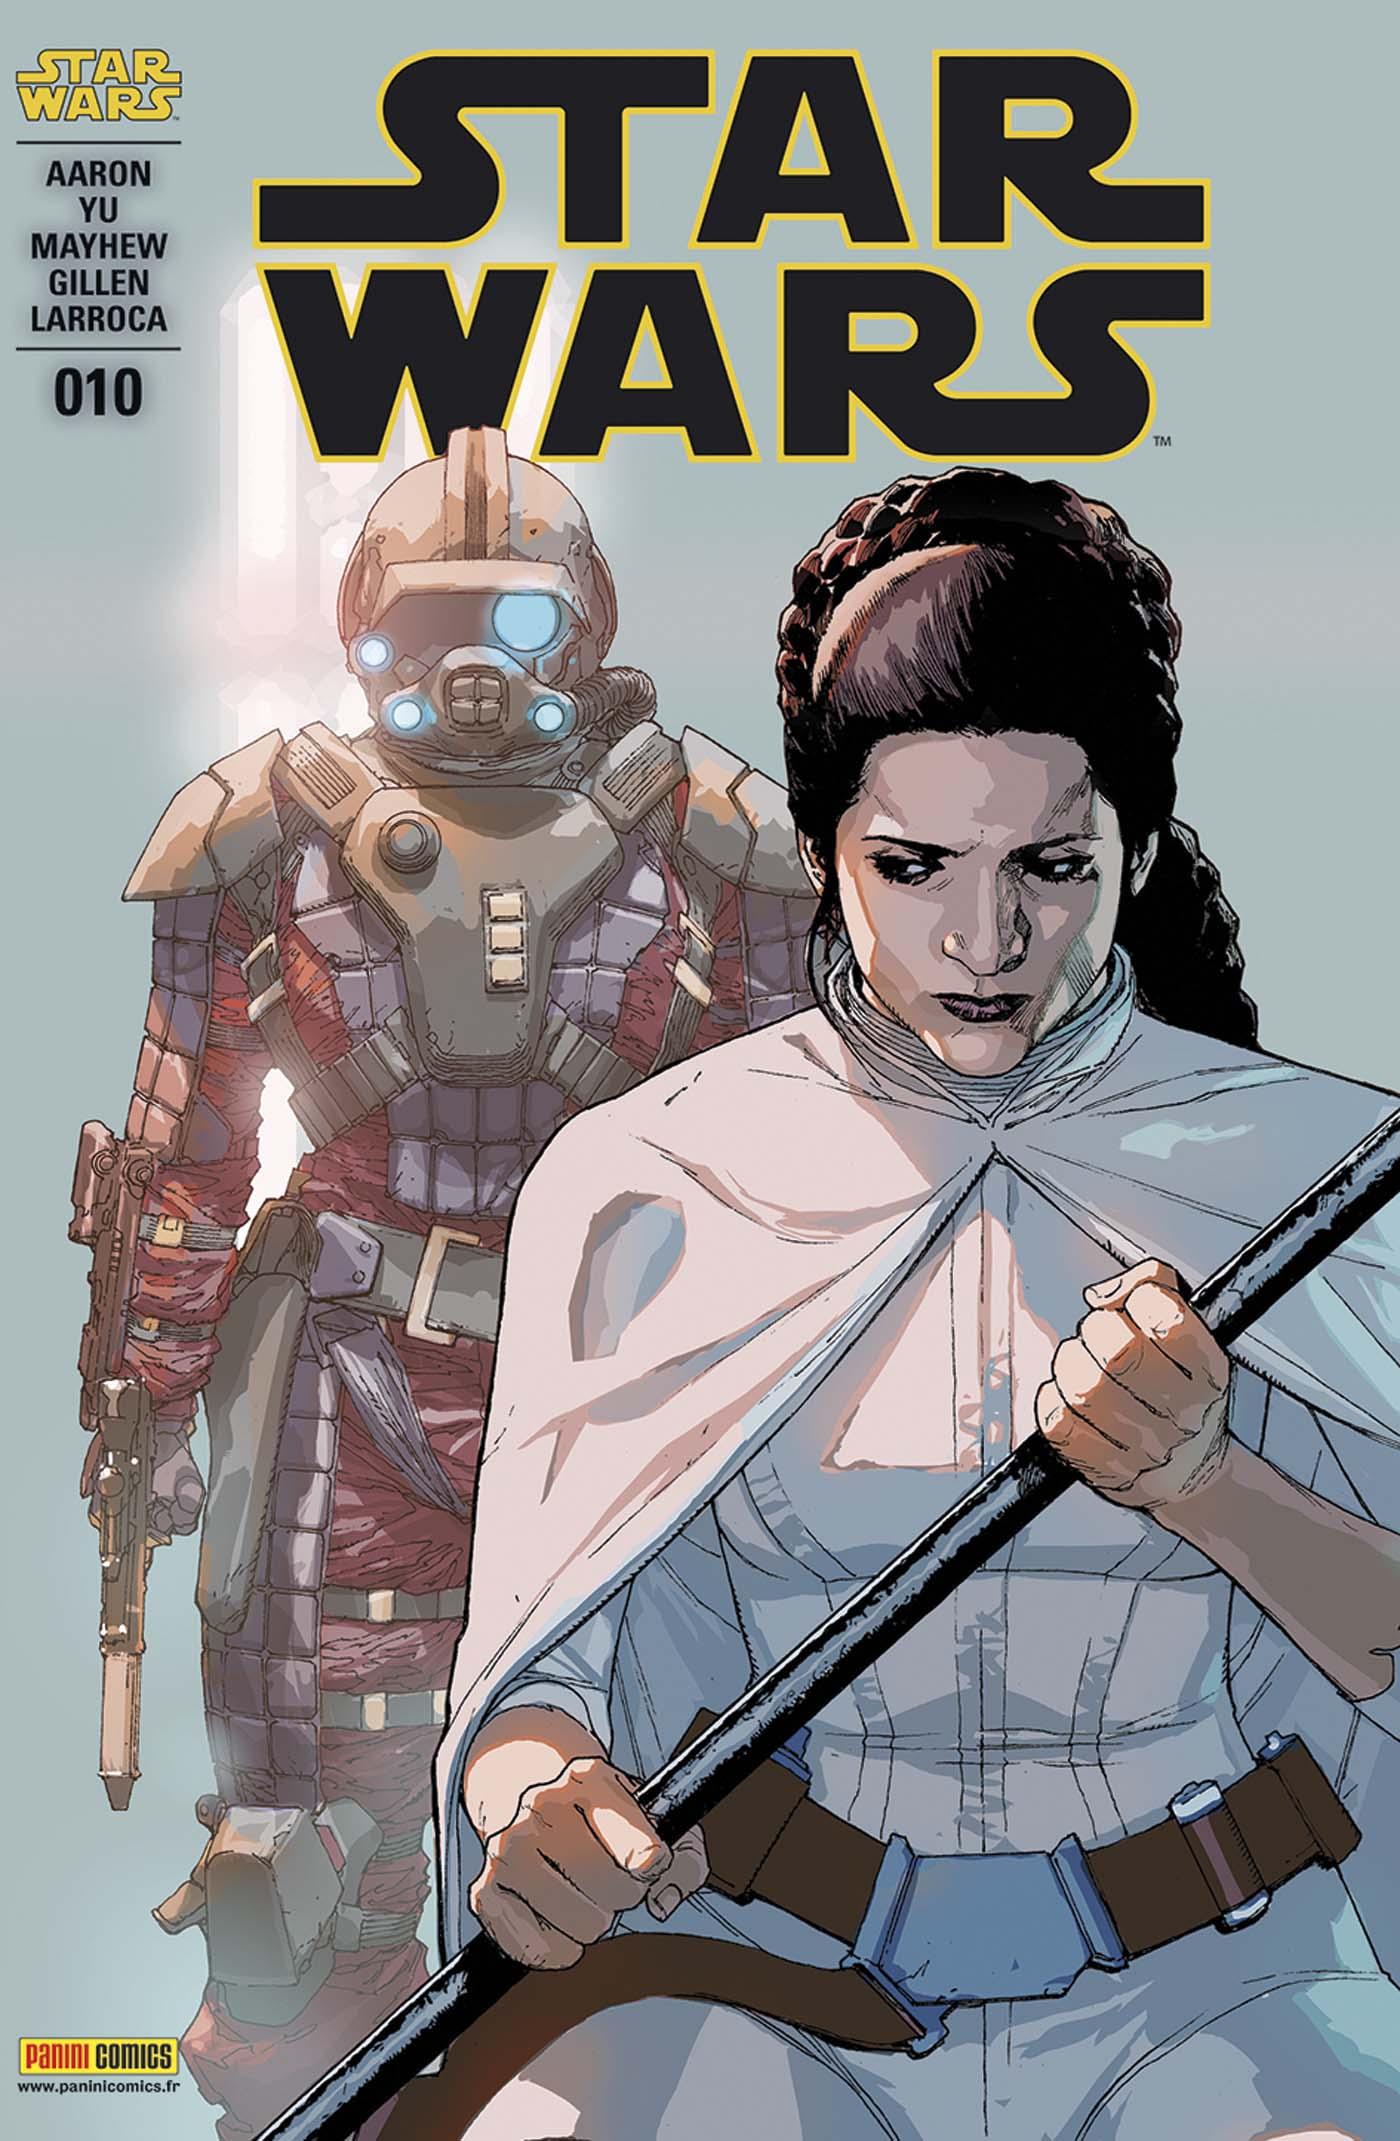 Star Wars 10 - couverture régulière : 1/2 (Leinil Francis Yu – tirage 50%)